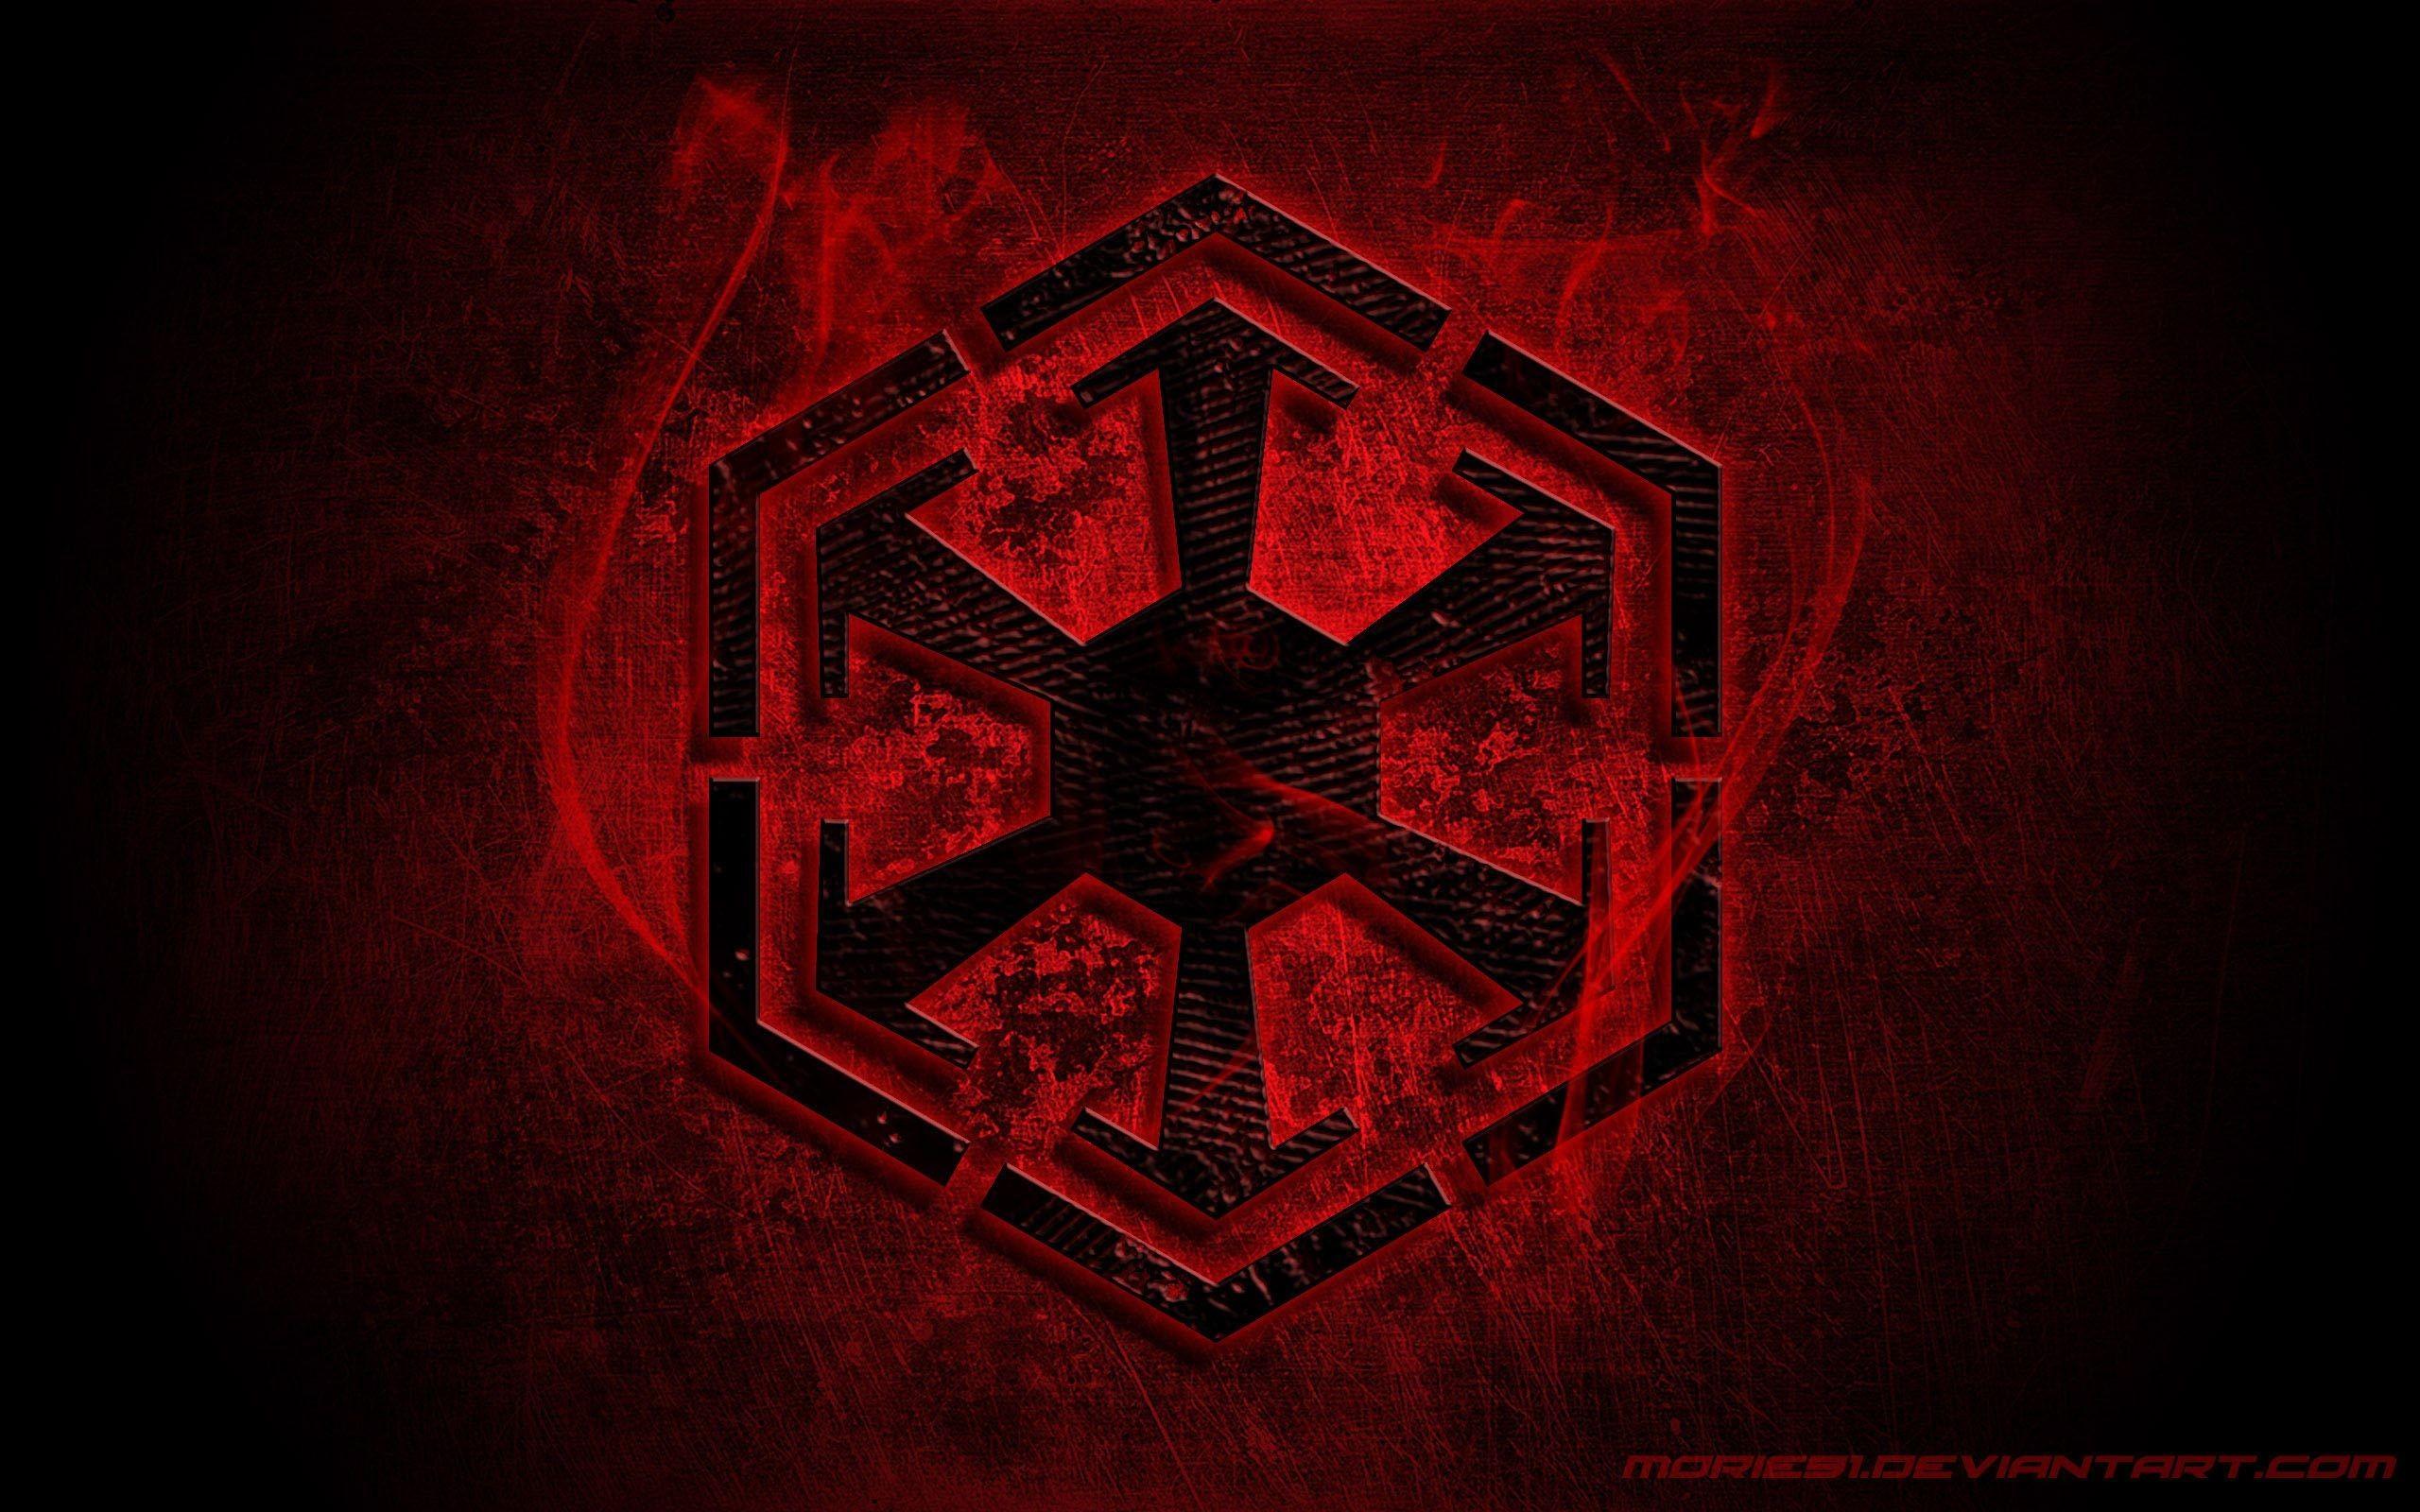 Star Wars Empire Wallpaper For Desktop Wallpaper 2560 x 1600 px 1.2 MB jedi  symbol code